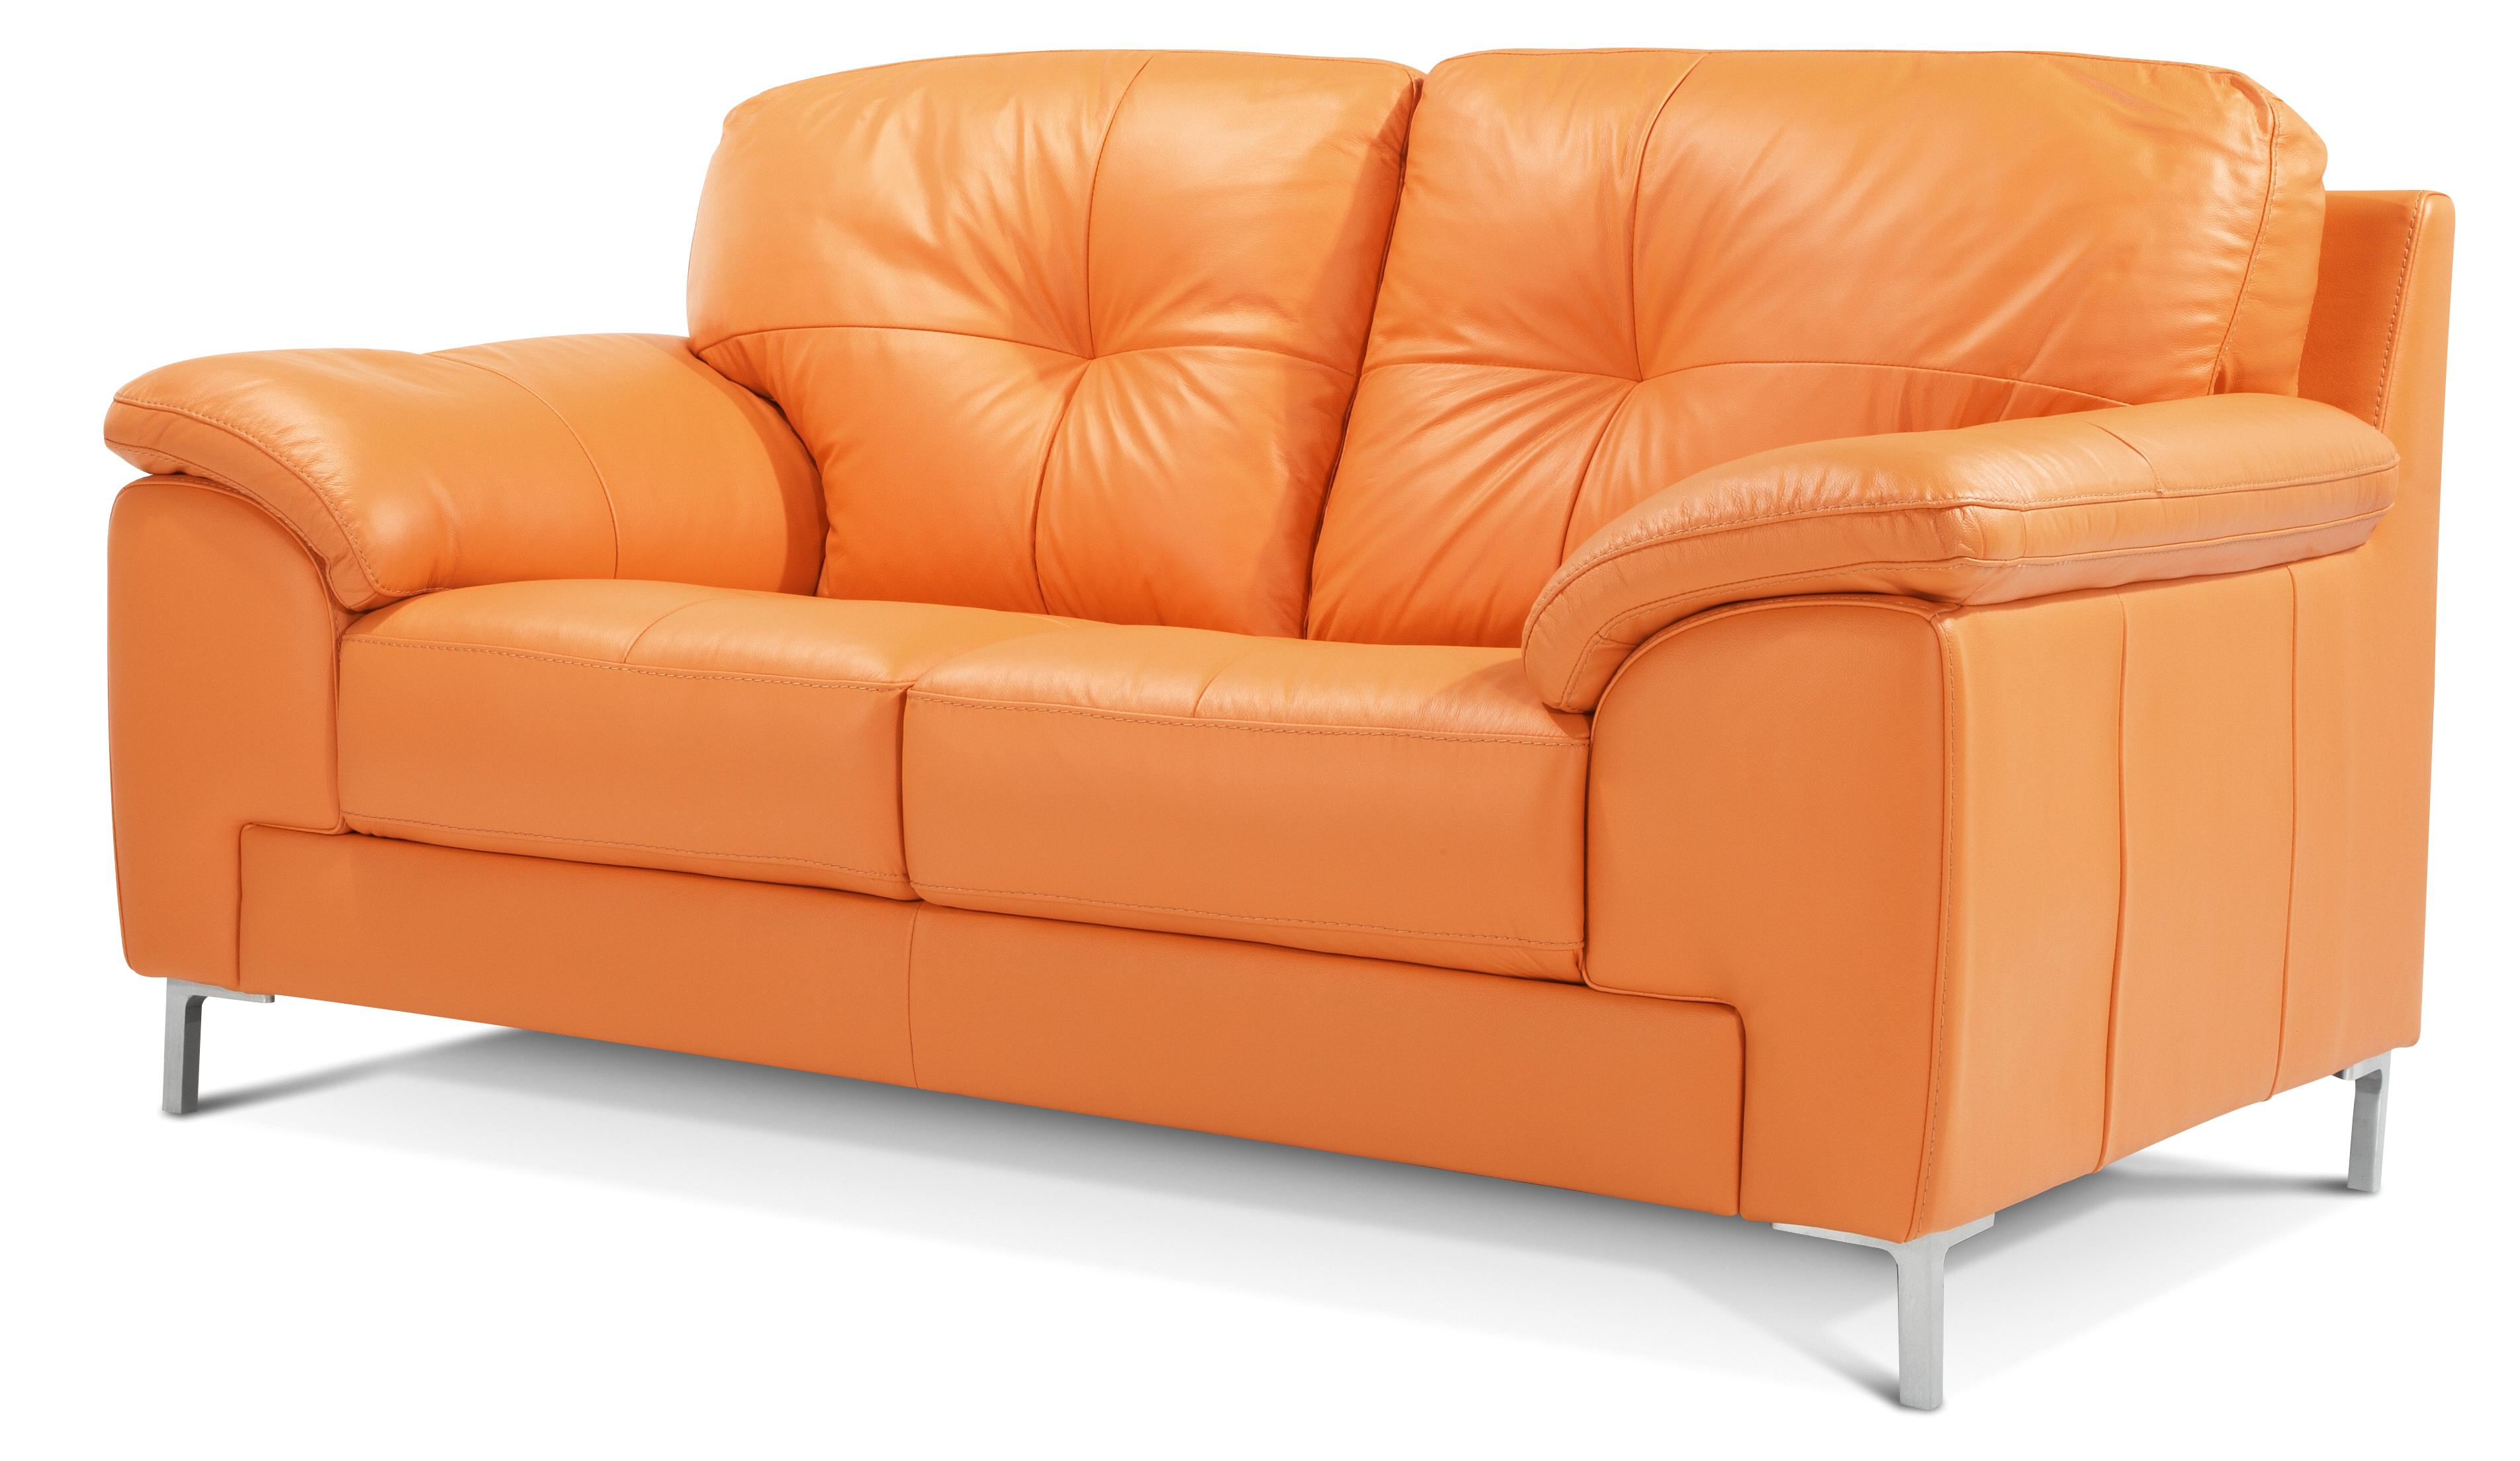 orange sofas ebay caspian right hand corner sofa black leather dfs ainsley 100 real 2 seater